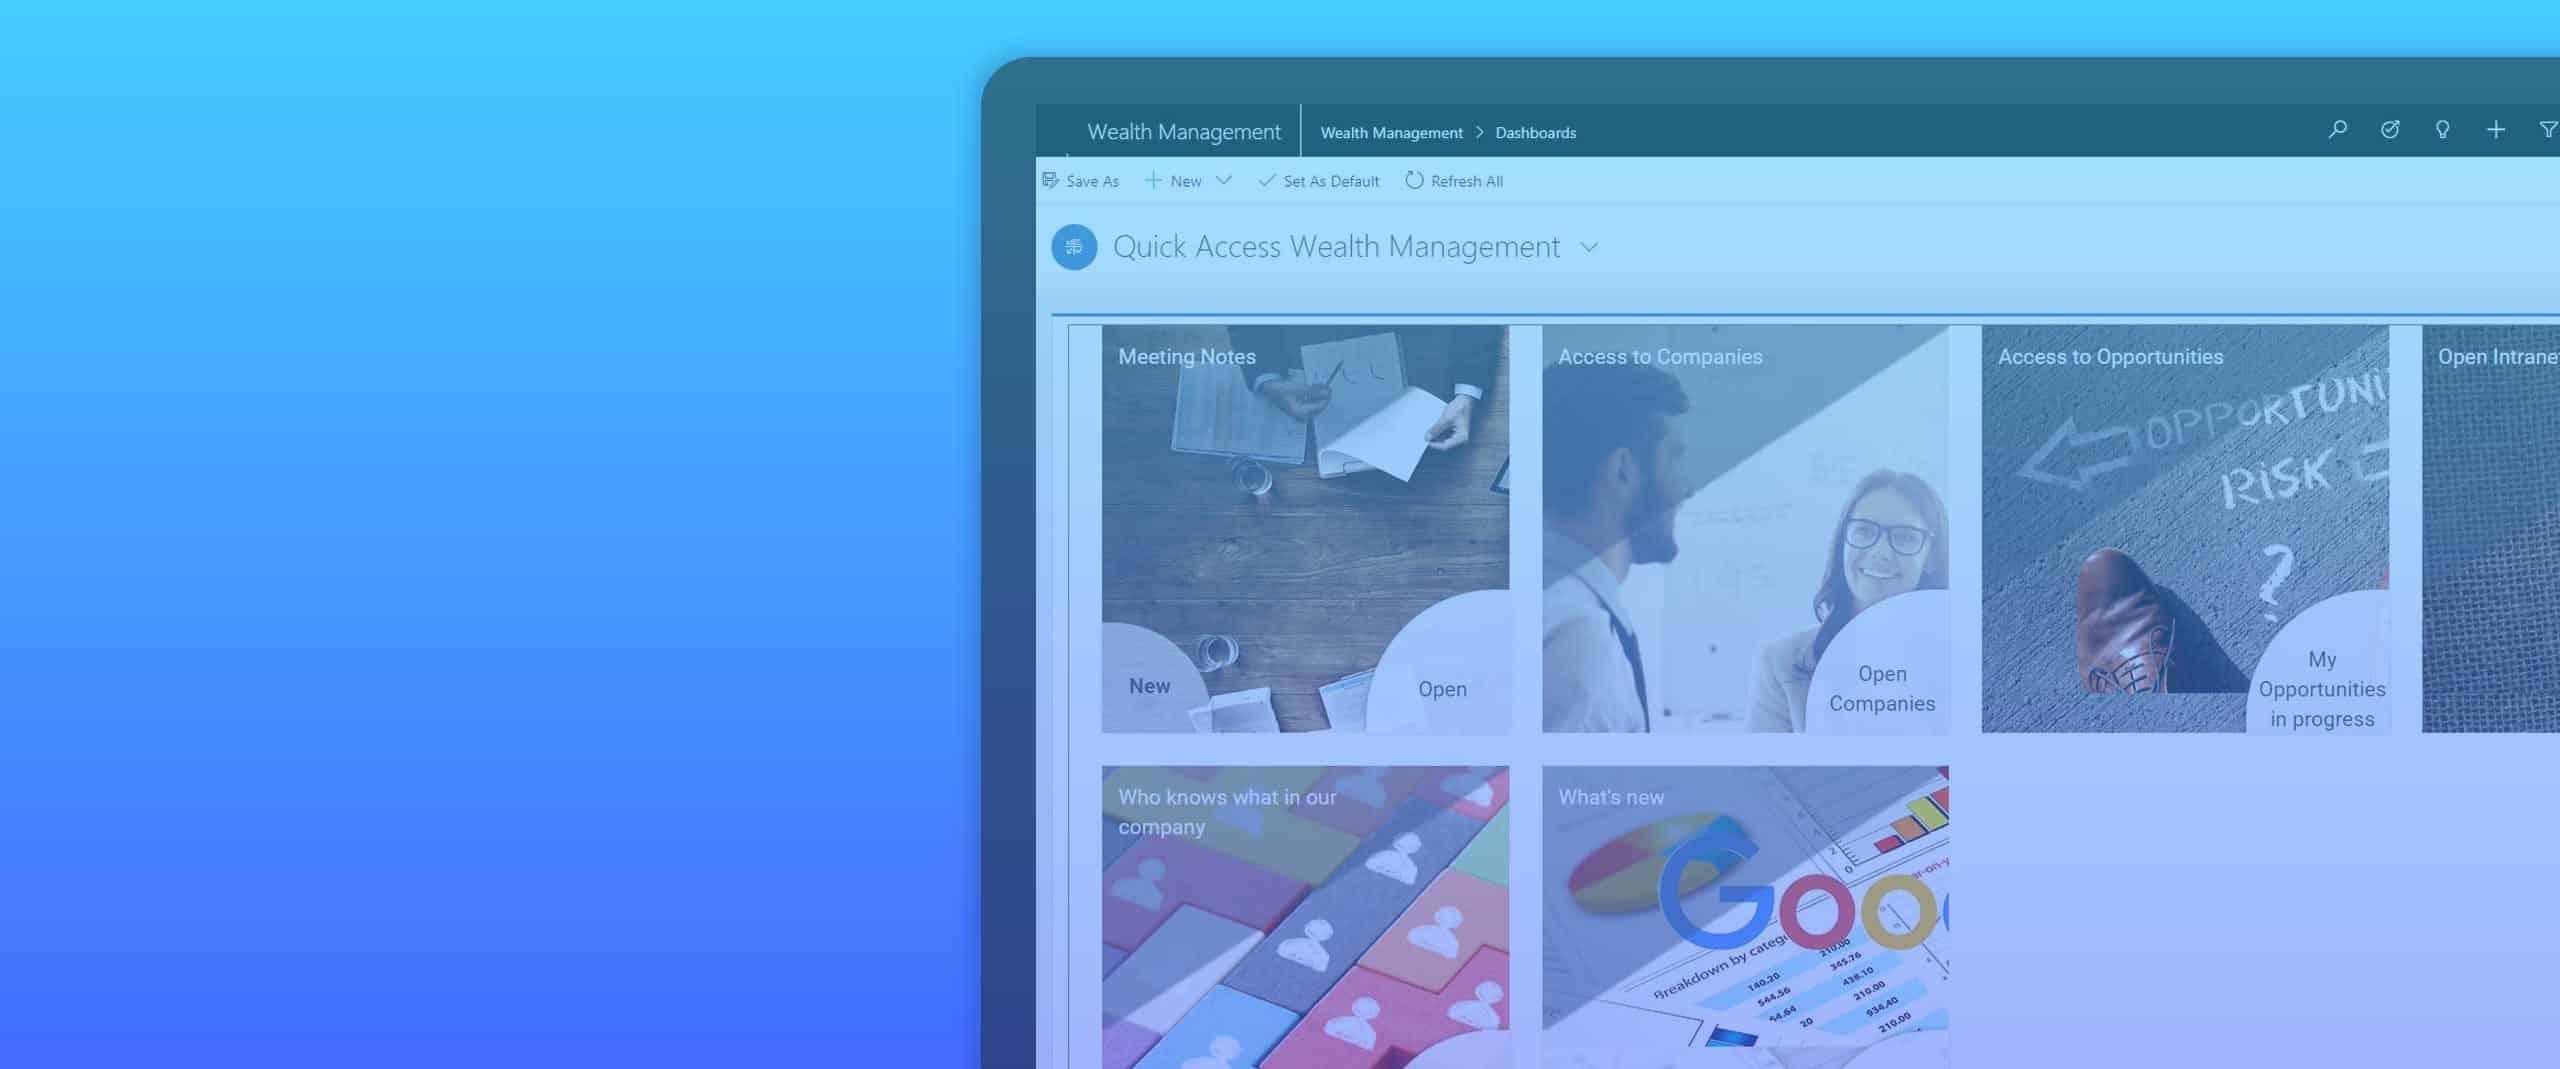 Wealth Management for Microsoft Dynamics 365 Sales